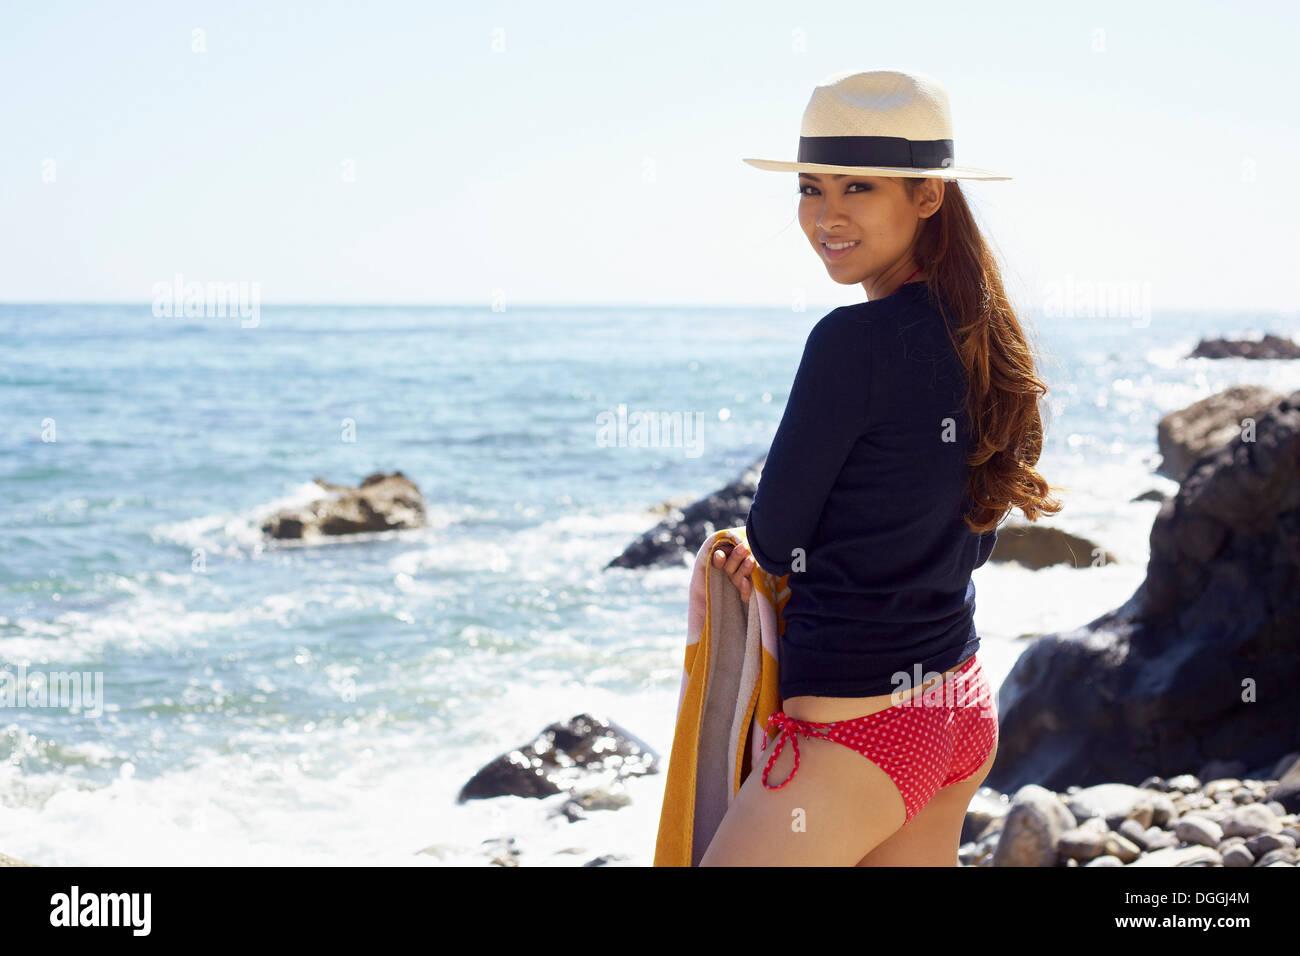 Young woman enjoying beach, Palos Verdes, California, USA - Stock Image